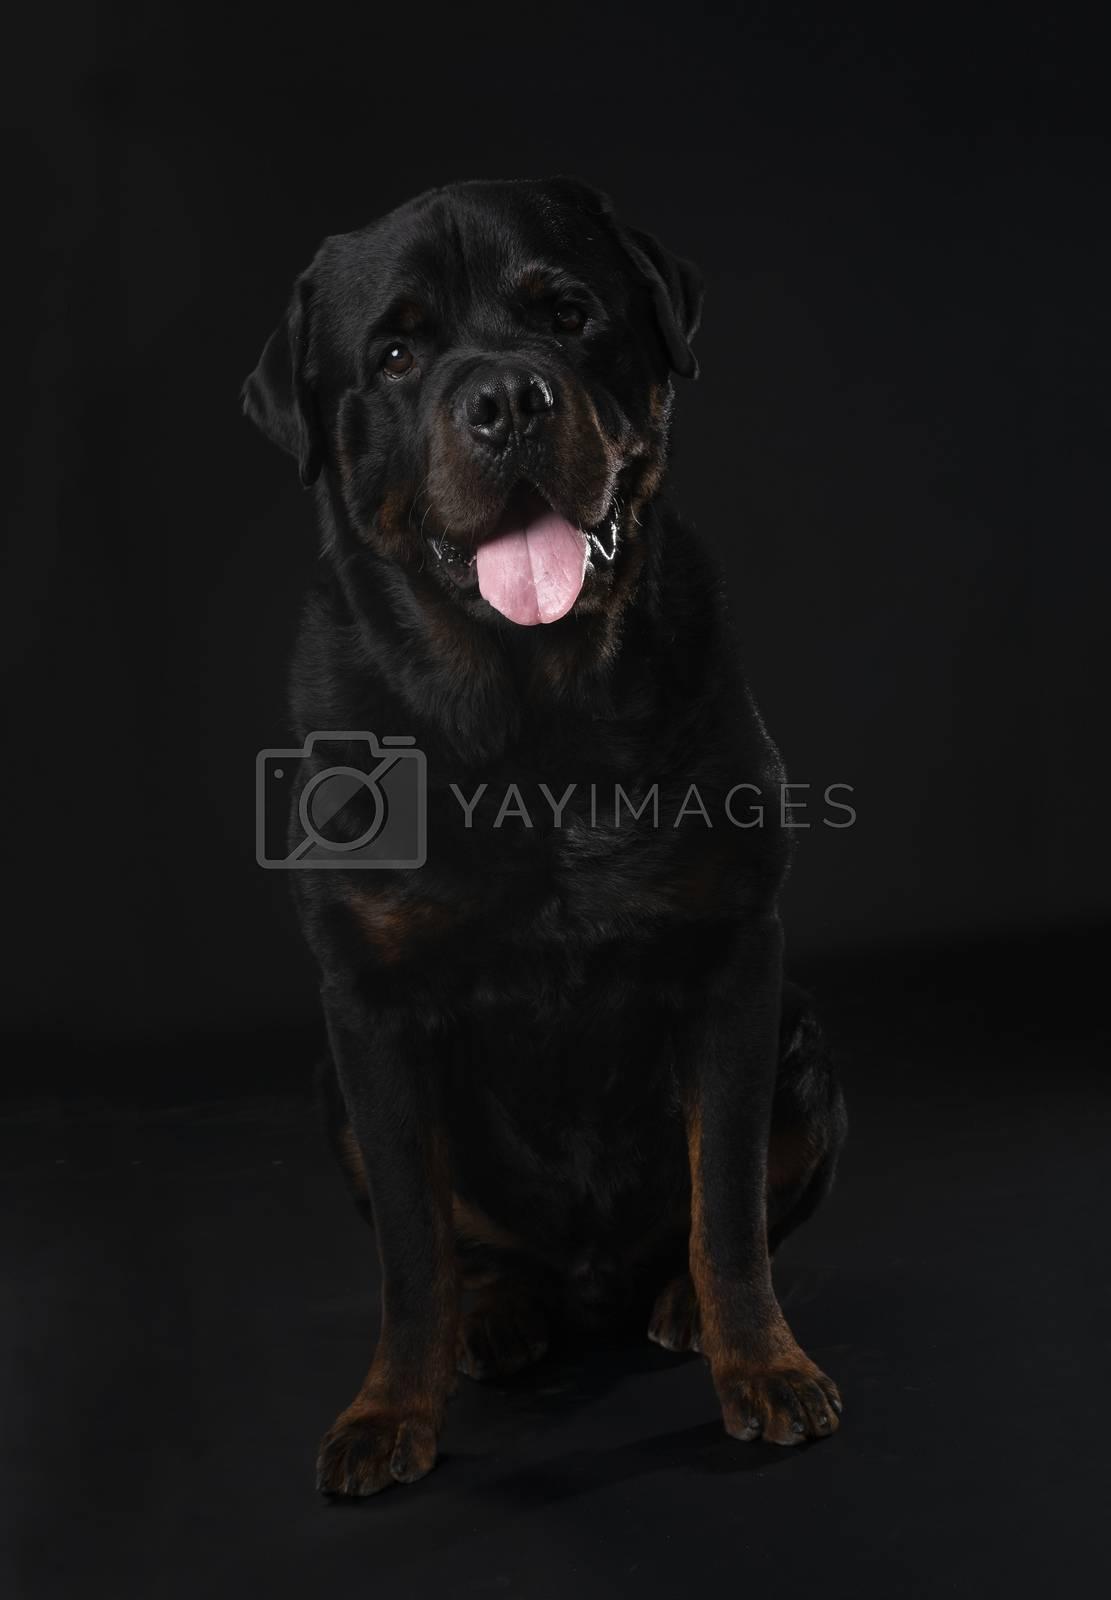 purebred rottweiler in front of black background